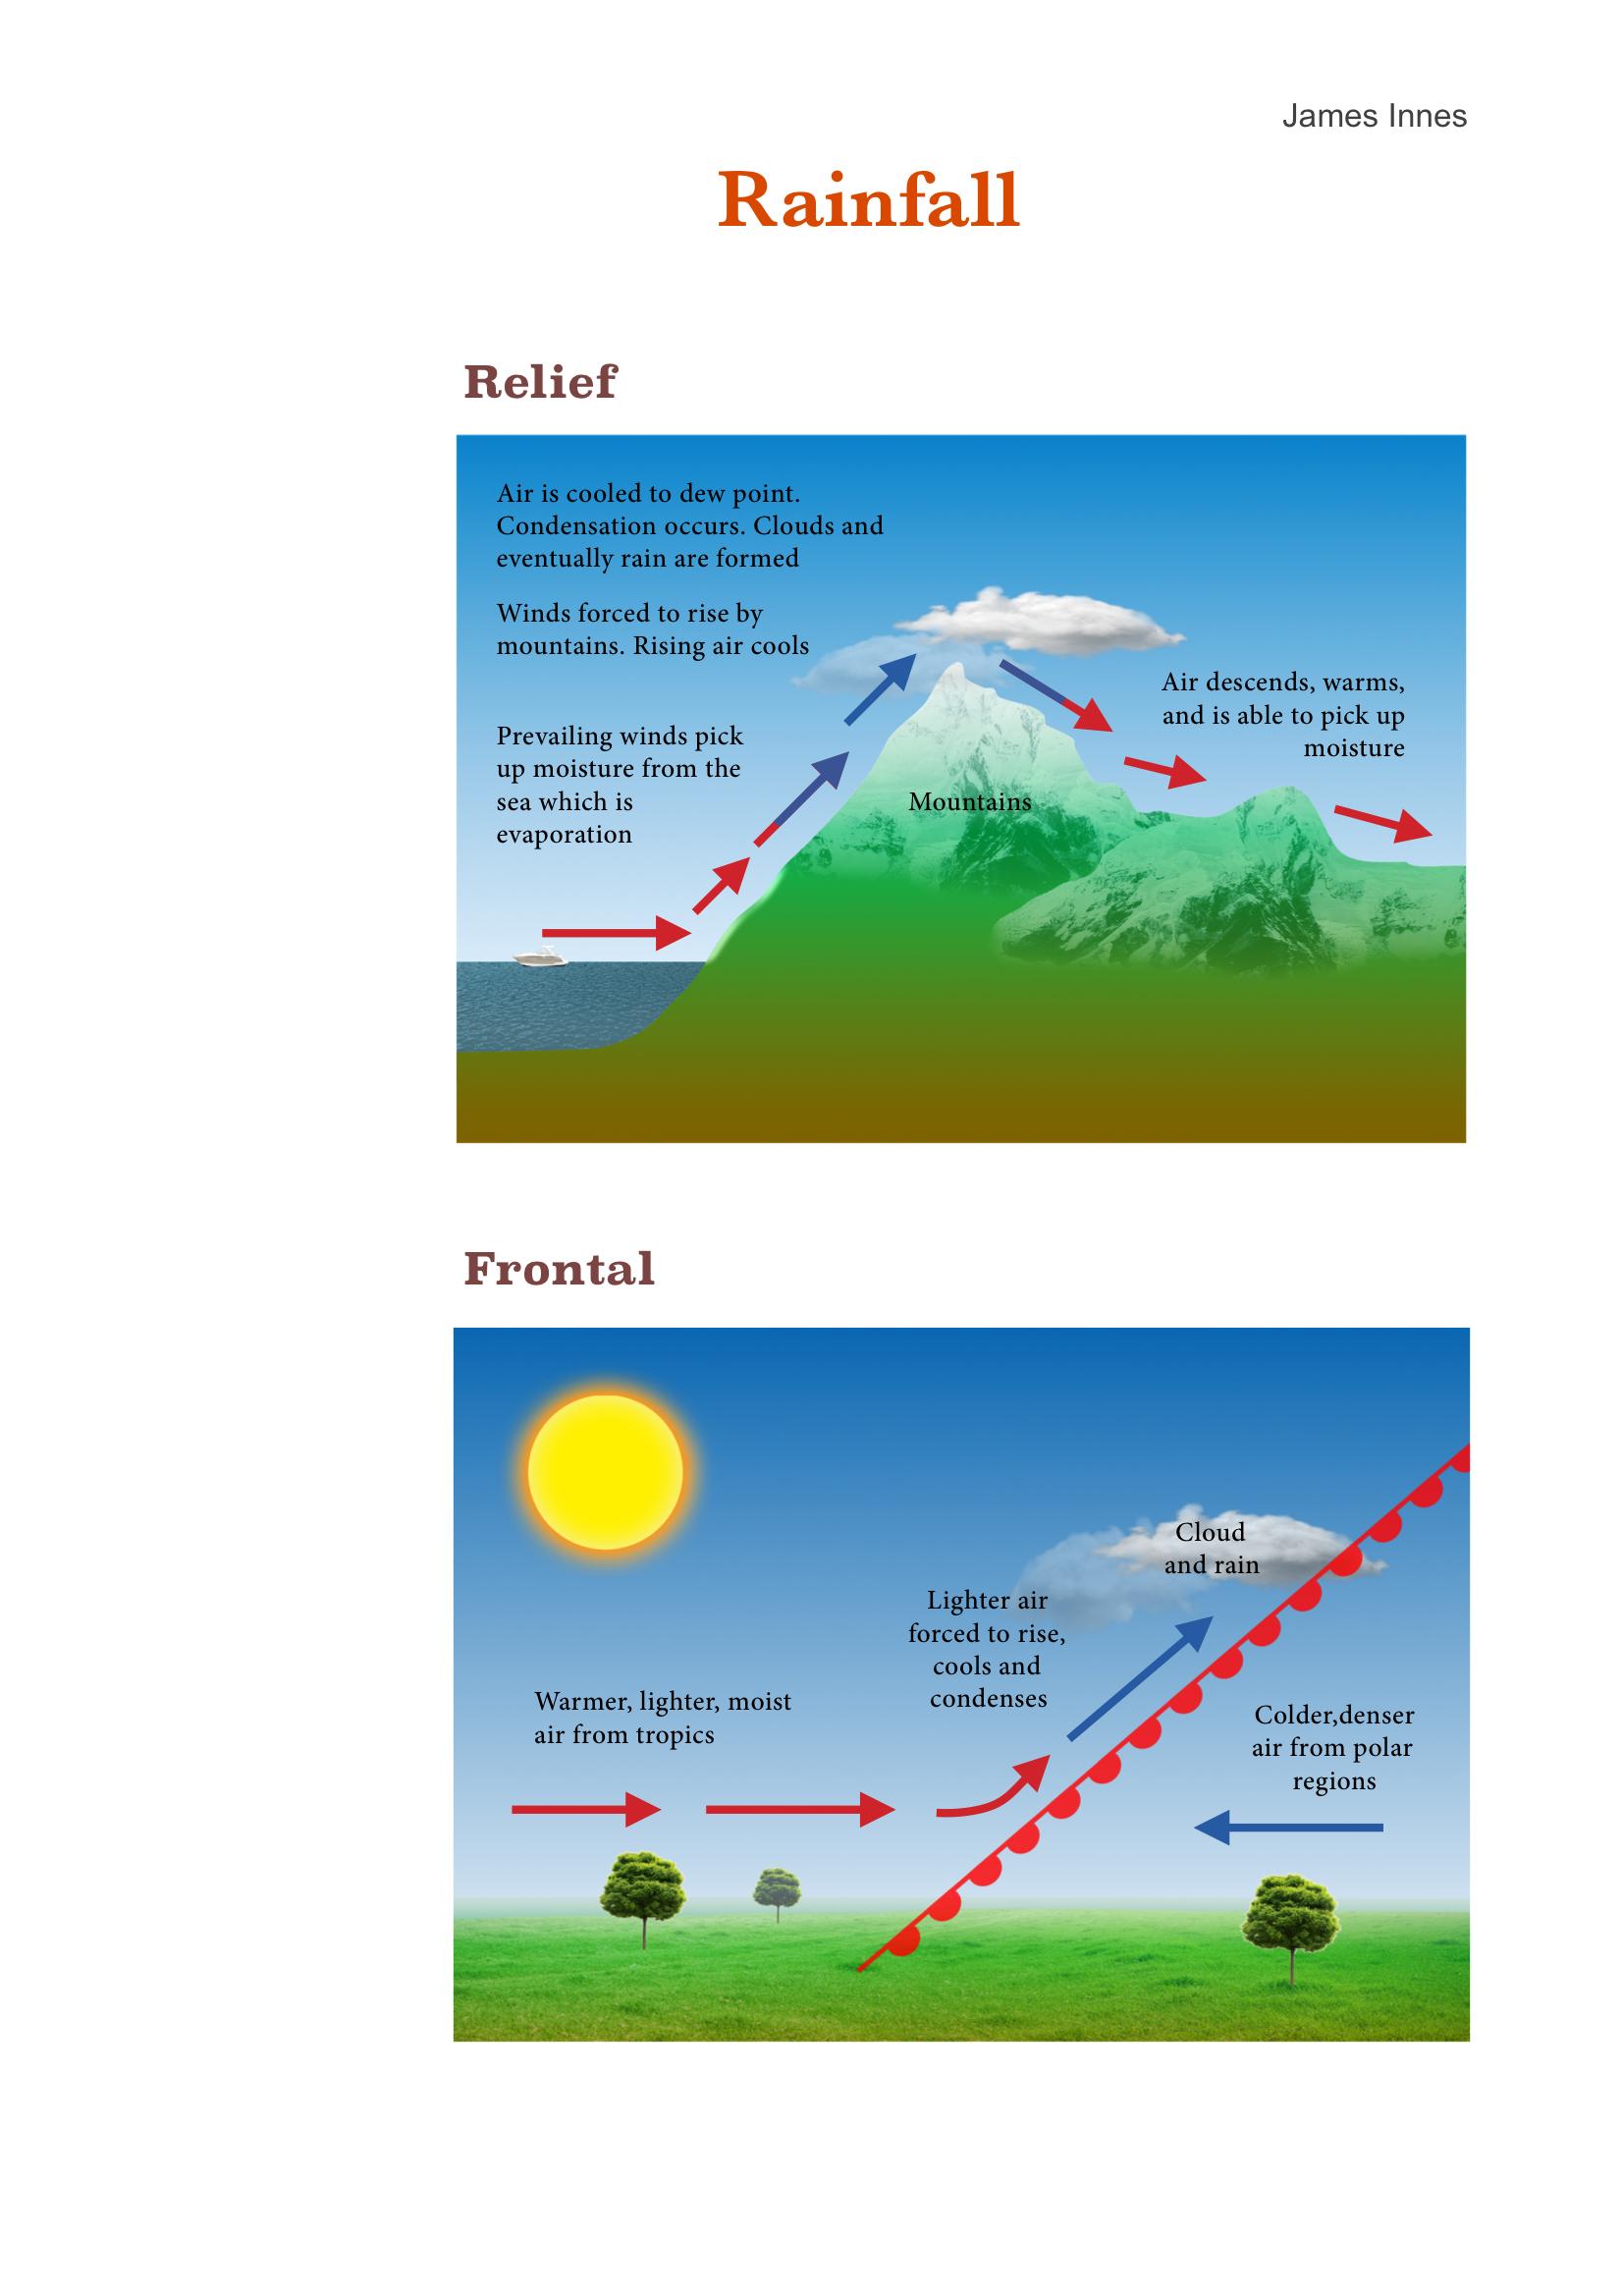 5. Rainfall